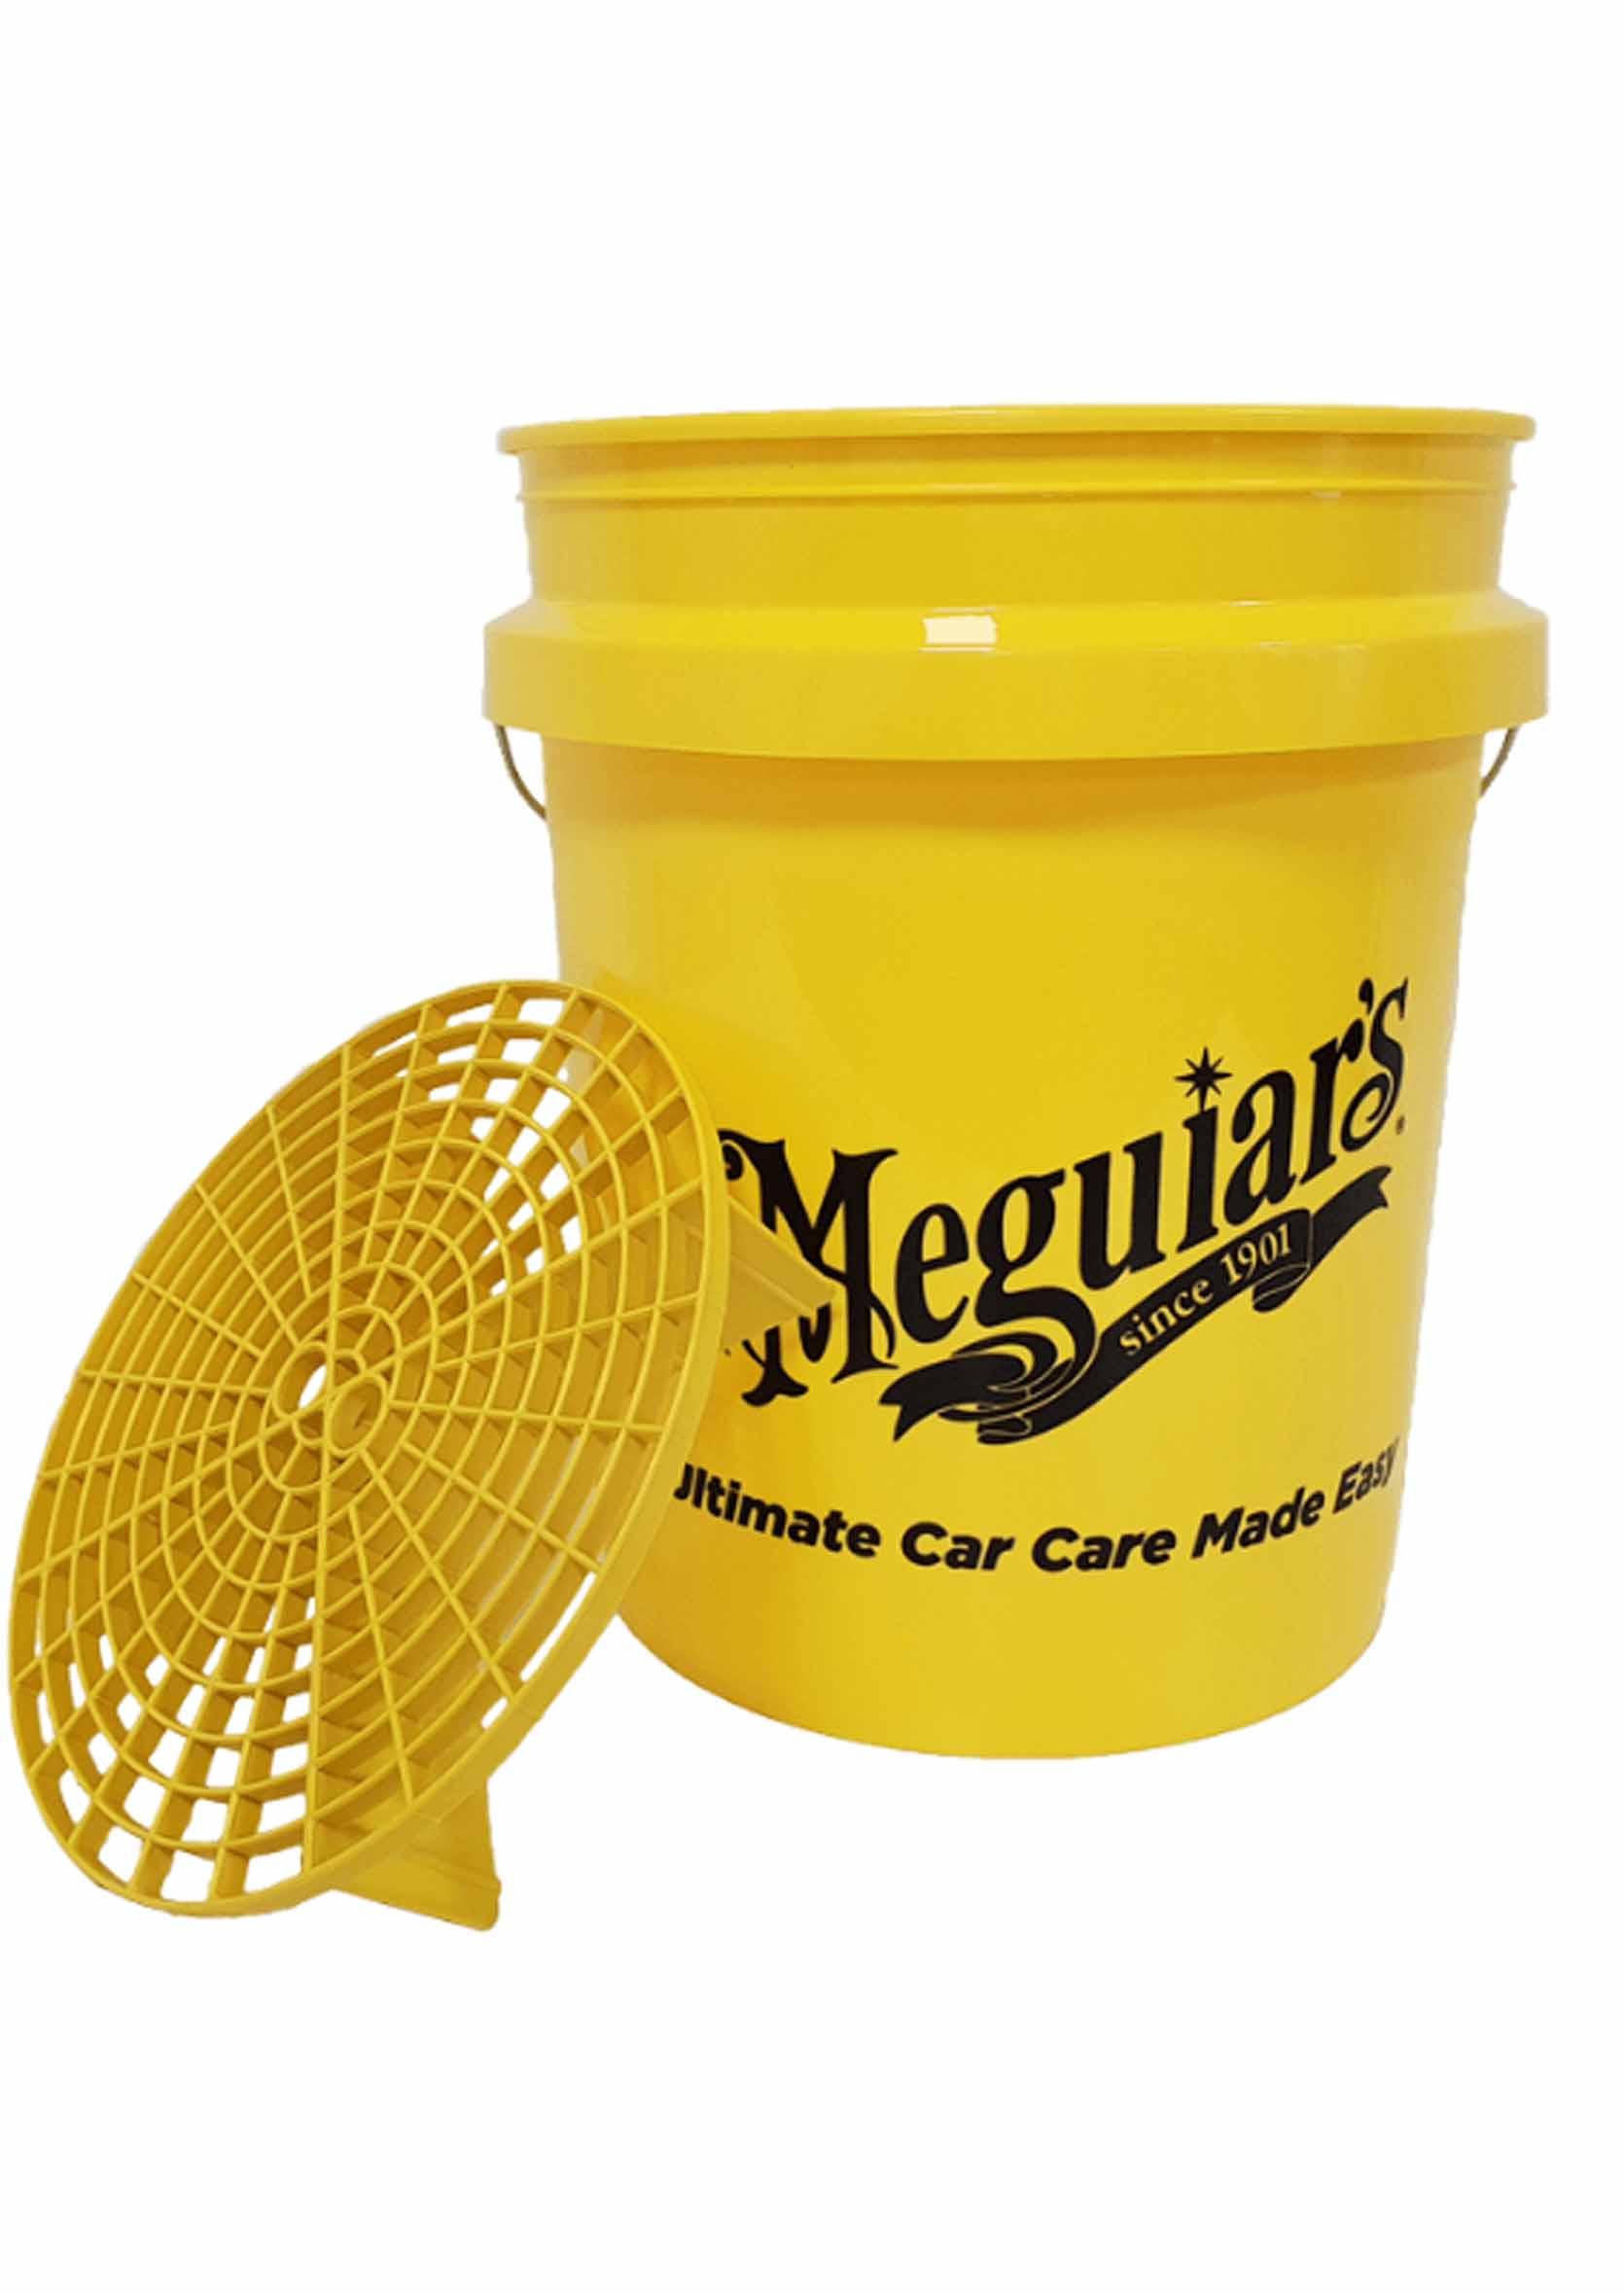 Meguiars Professional Wash Bucket 18,9L Wiadro z Separatorem Brudu do Mycia Auta